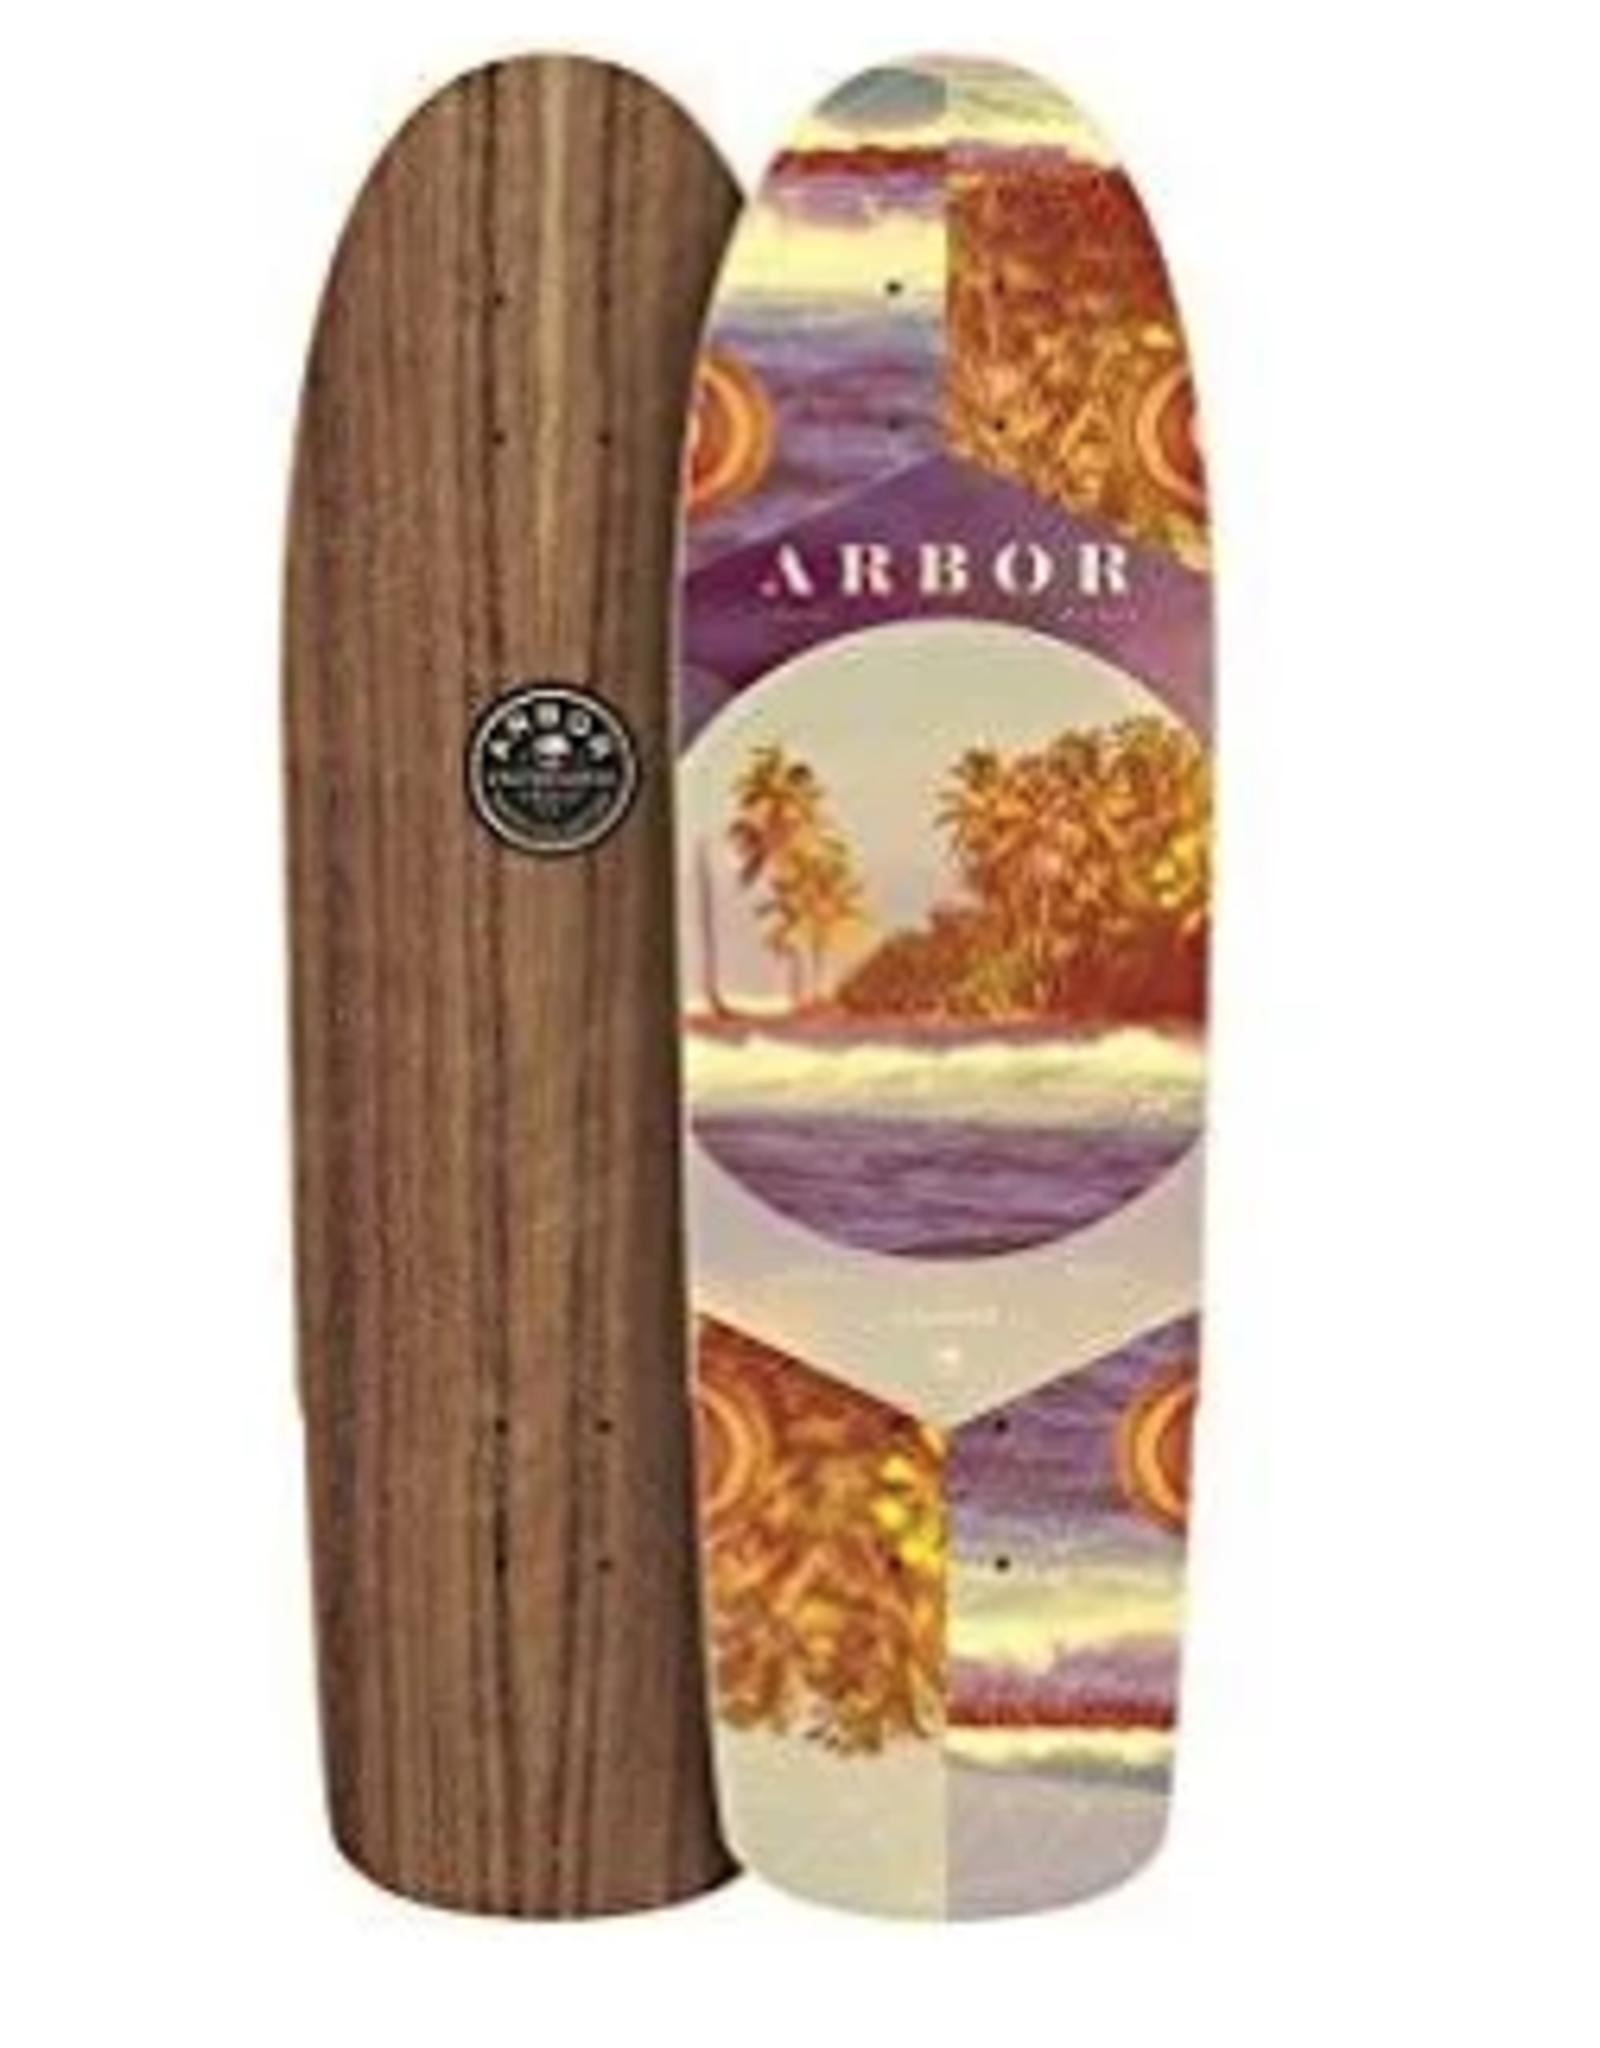 ARBOR ARBOR PHOTO COLLECTION PILSNER DECK-8.25X28.75